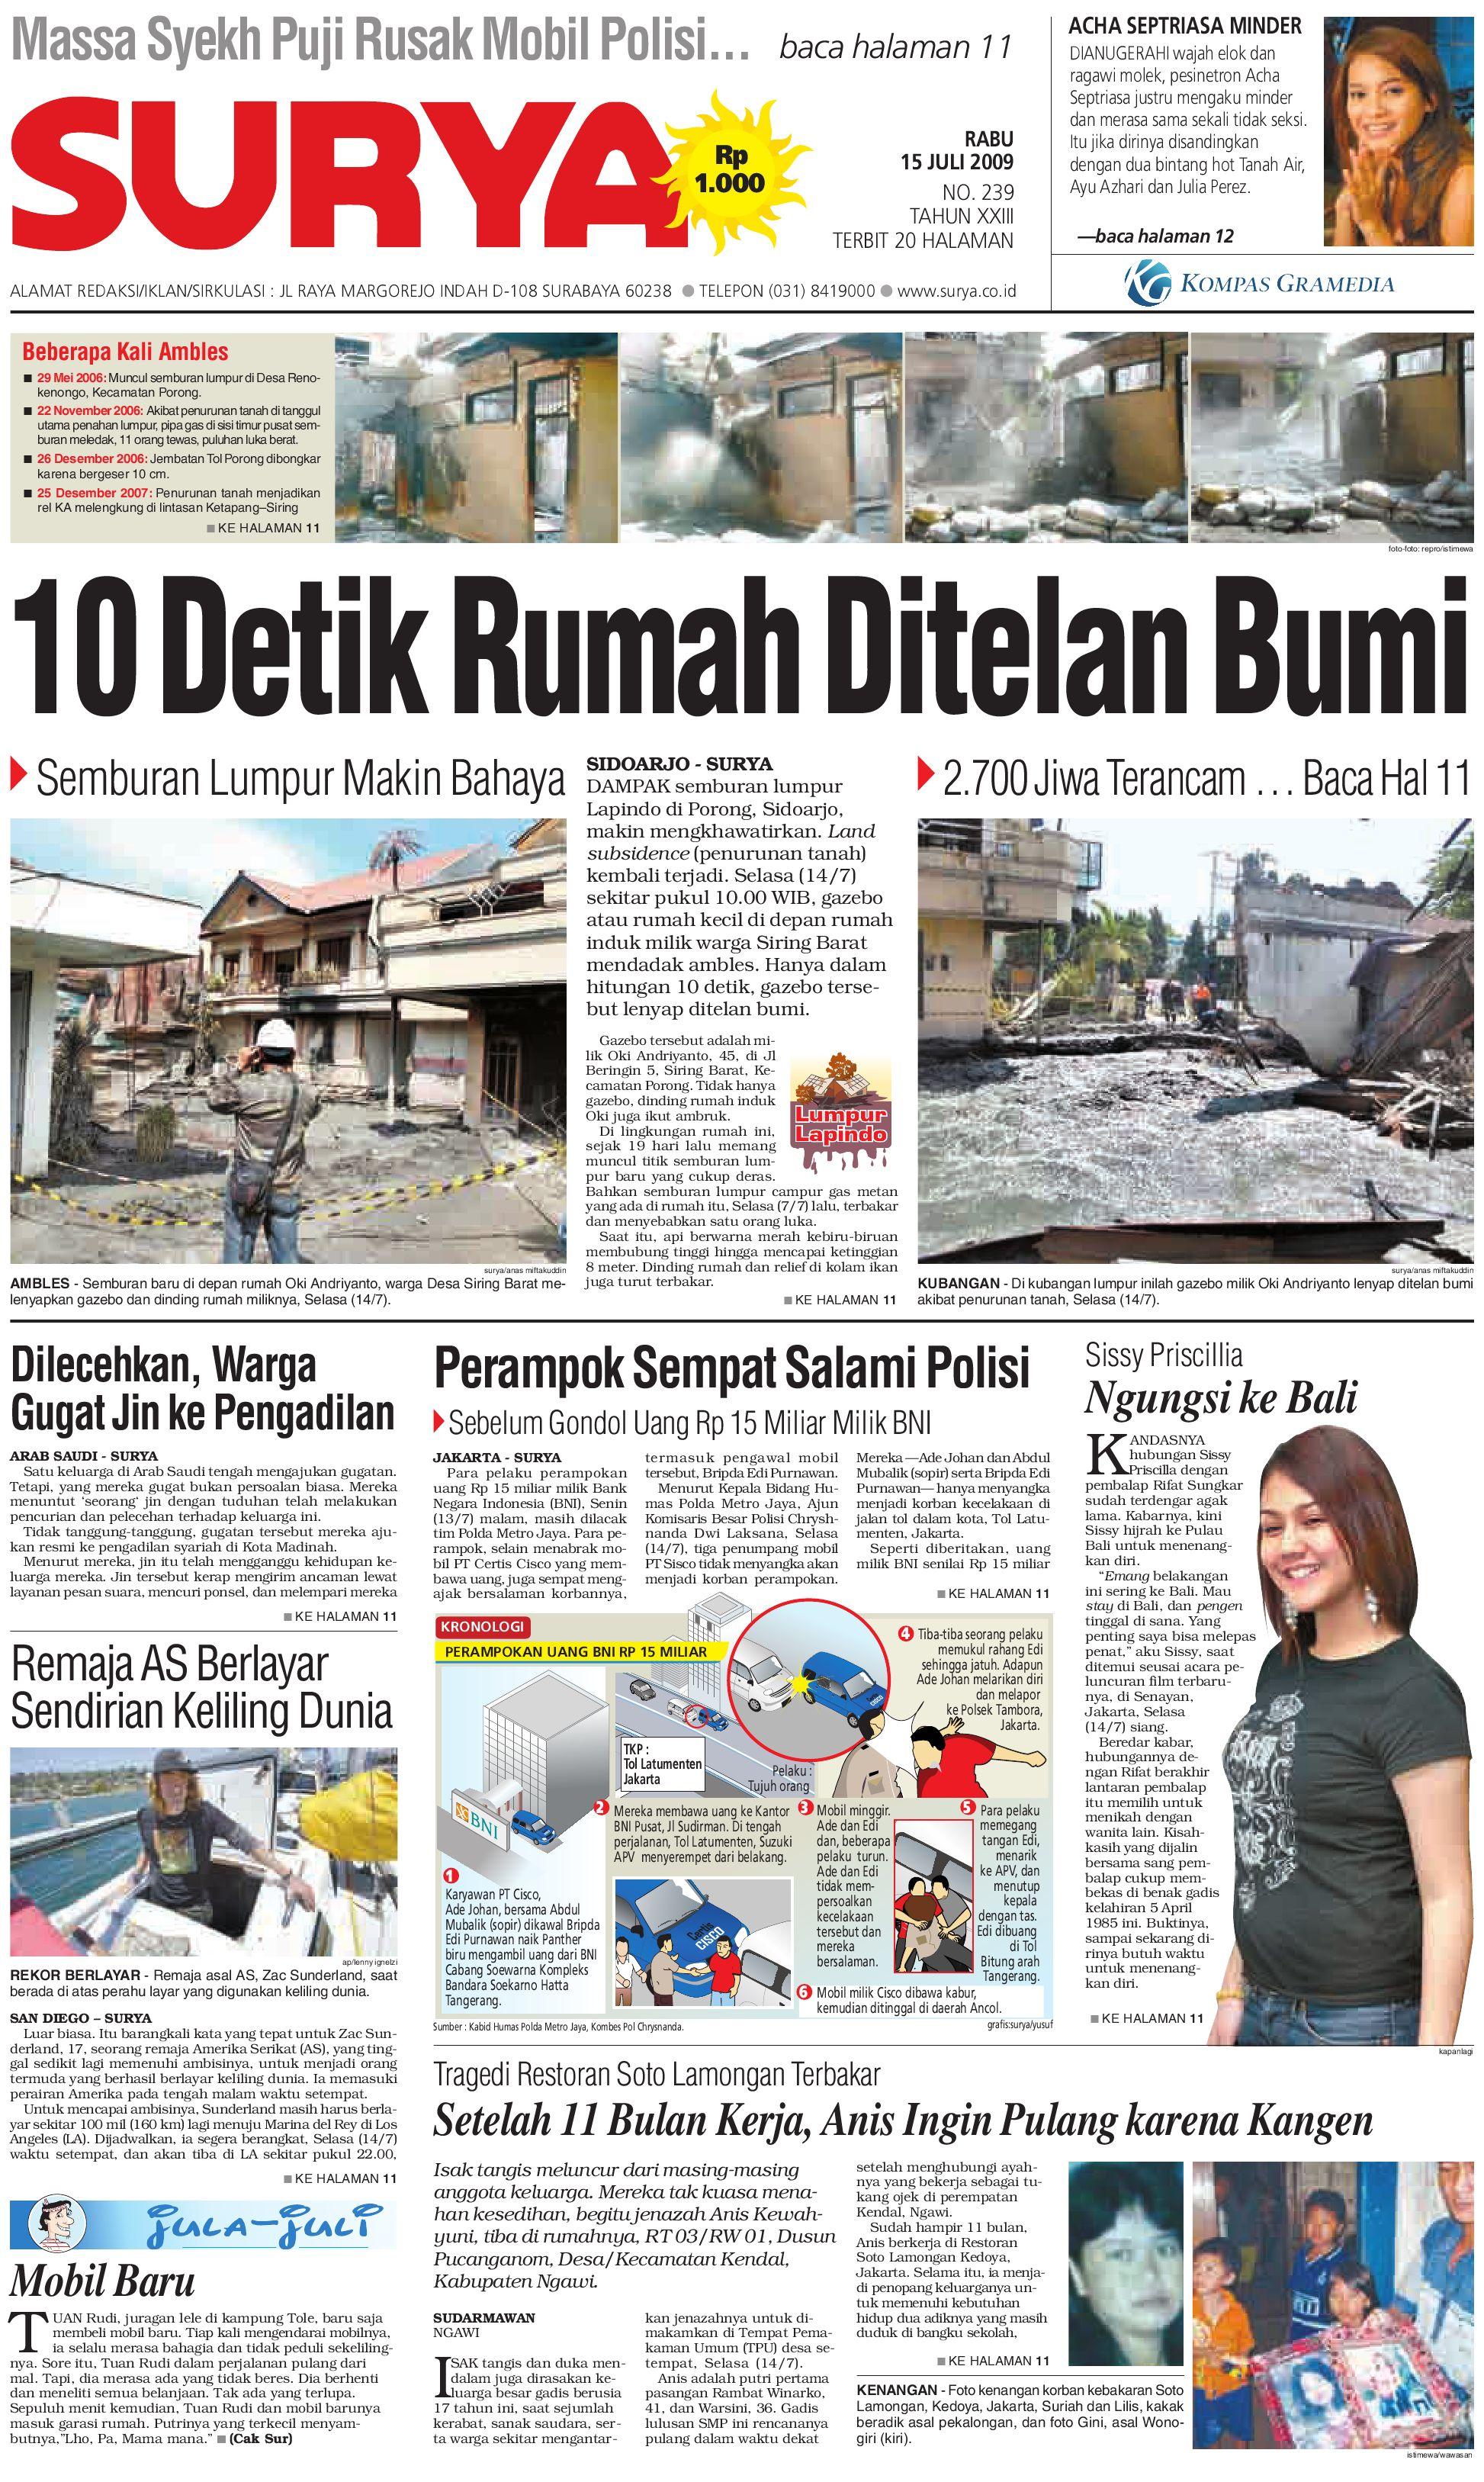 Surya Edisi Cetak 15 Juli 2009 By Harian Issuu Kopi Bubuk Hitam Kapal Api Tanpa Gula 10x6 5 Gram